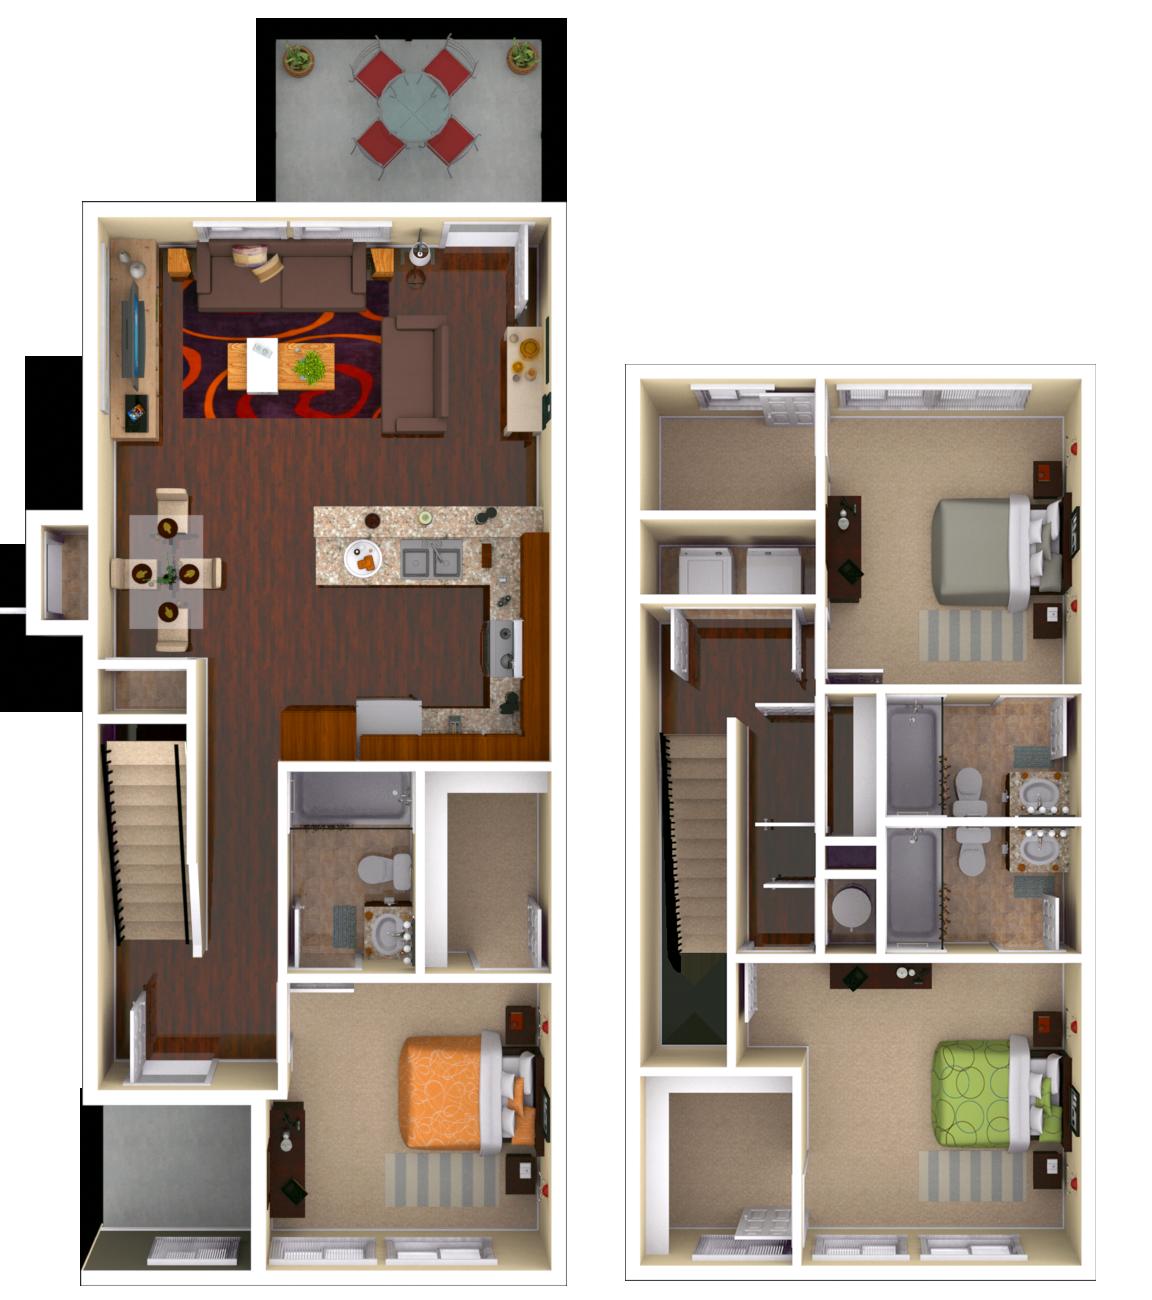 Milledge 3 BR 3 BATH Floor Plan